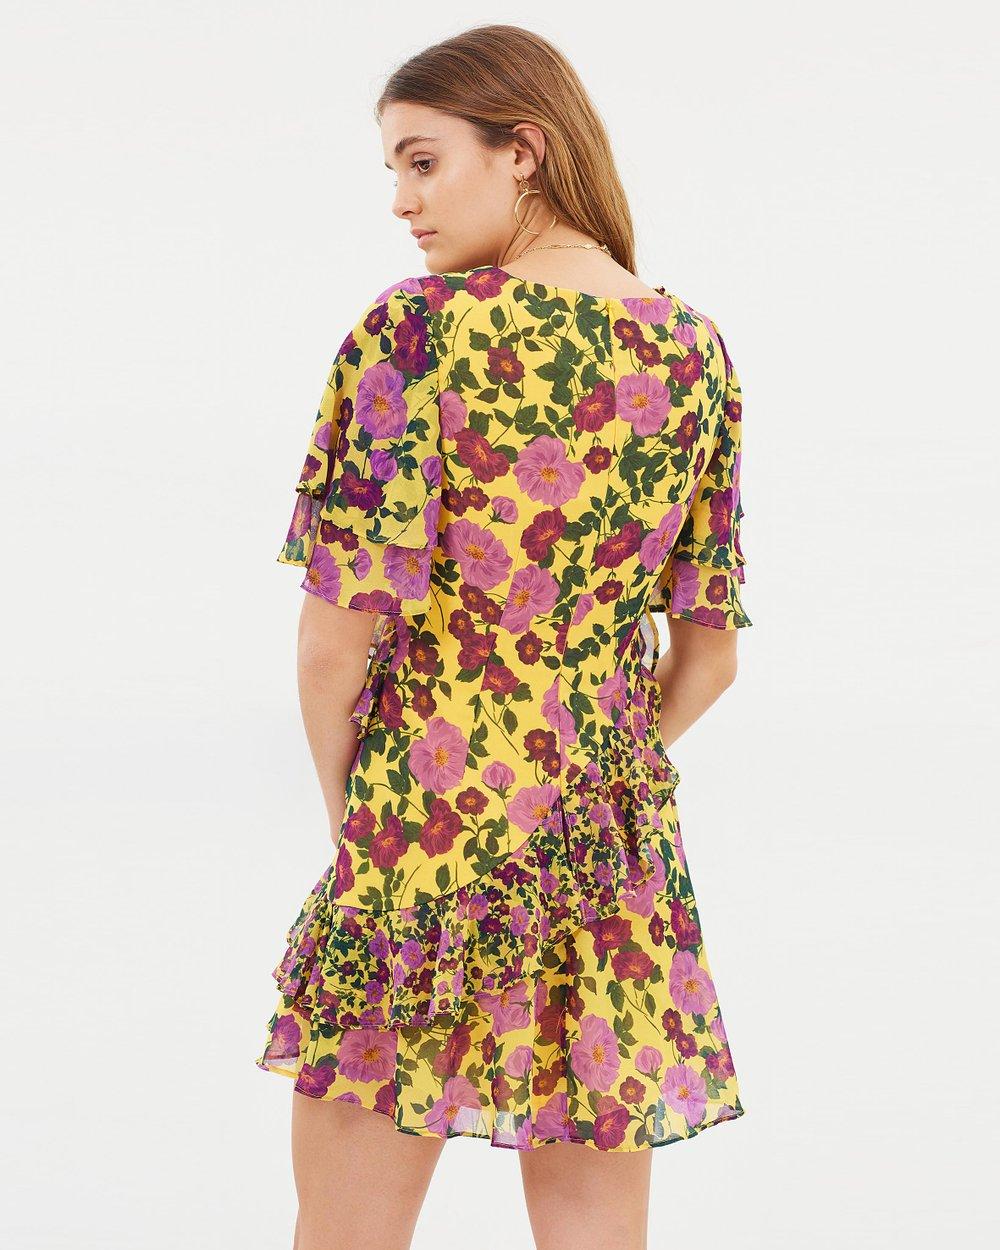 bd4c26f2e9b69 Waves Mini Dress by Keepsake the Label Online | THE ICONIC | Australia